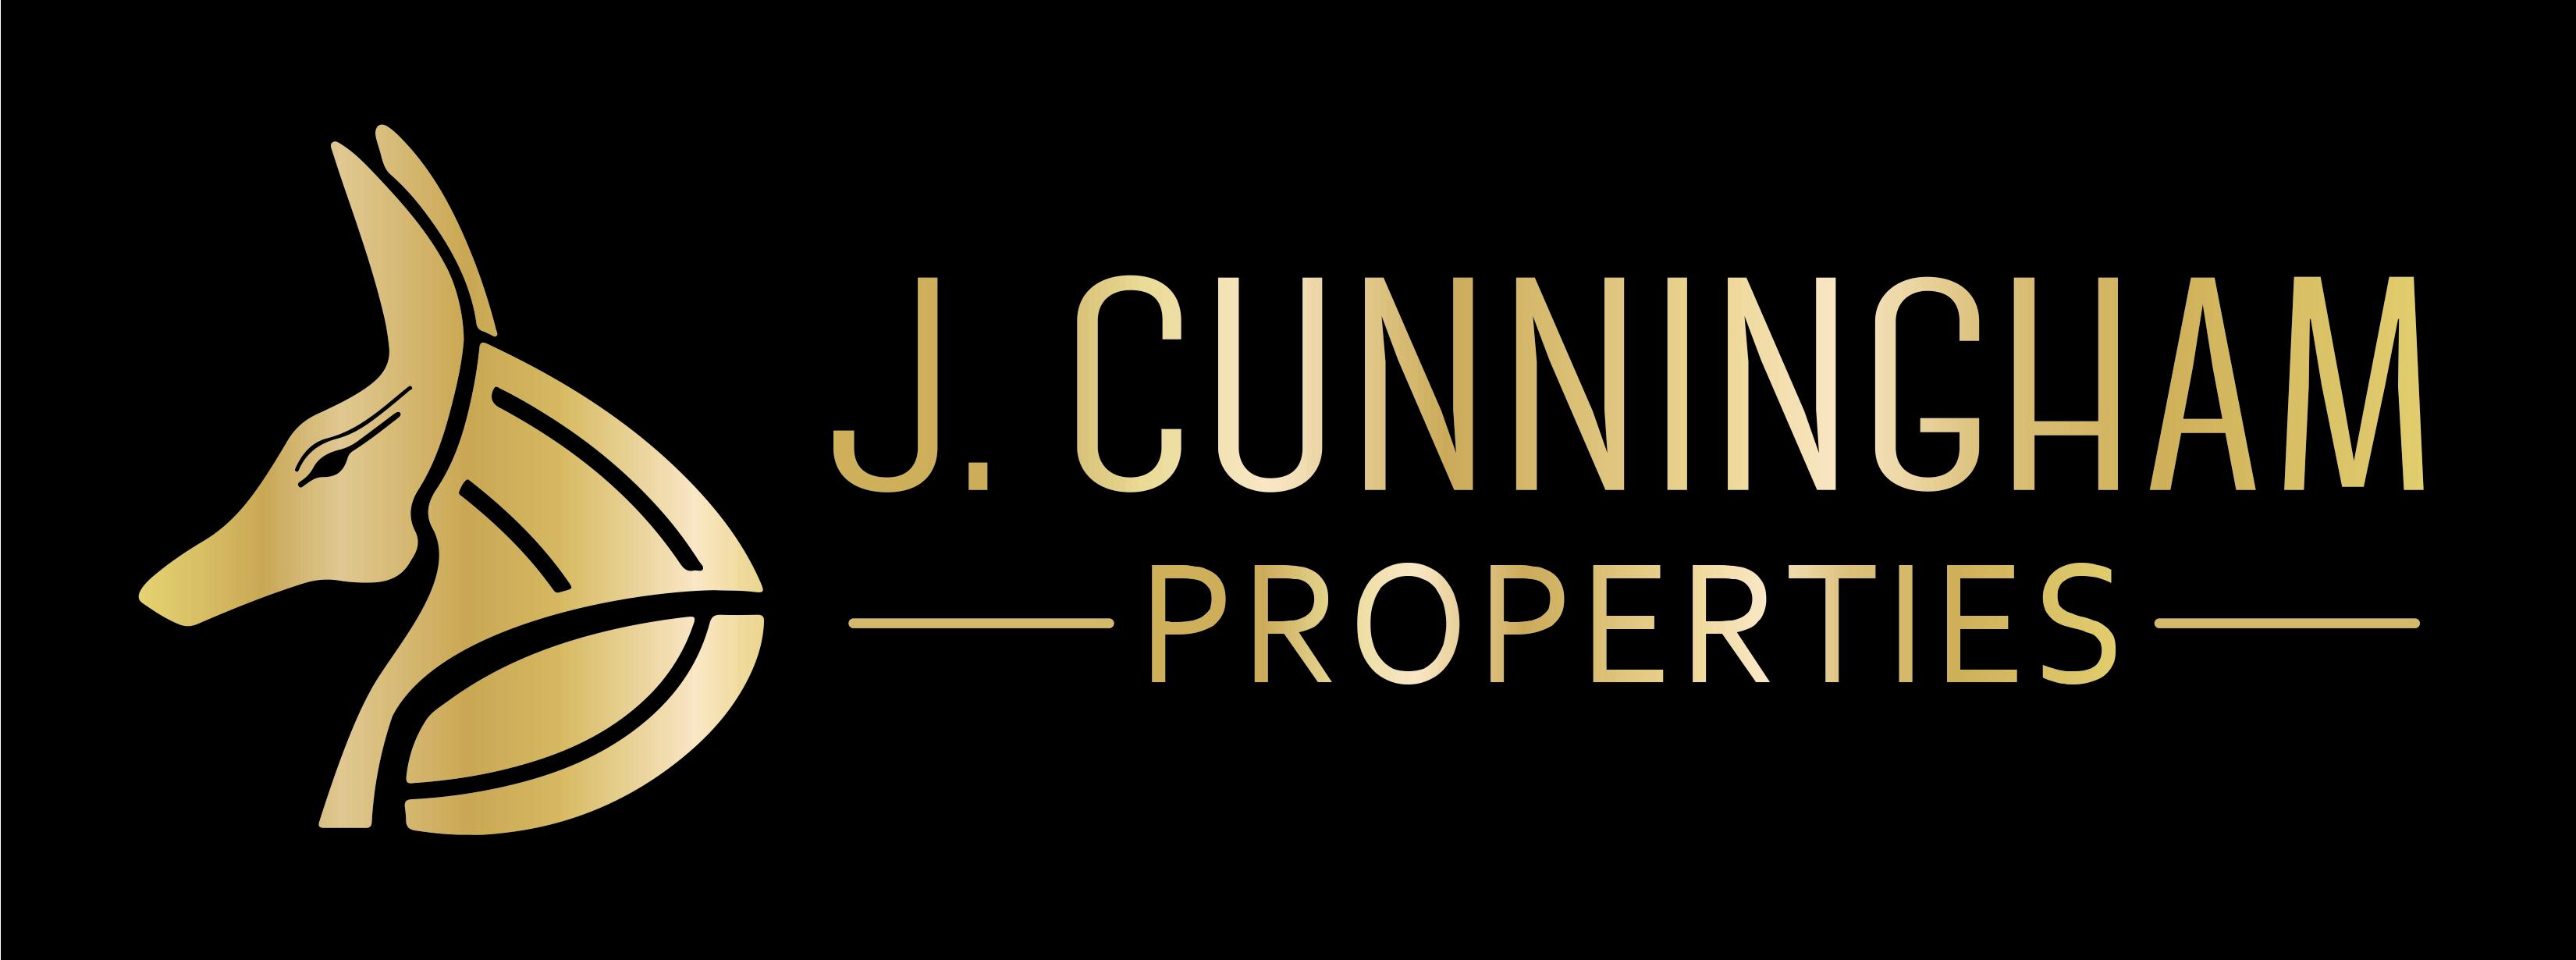 J. Cunningham Properties Logo Design